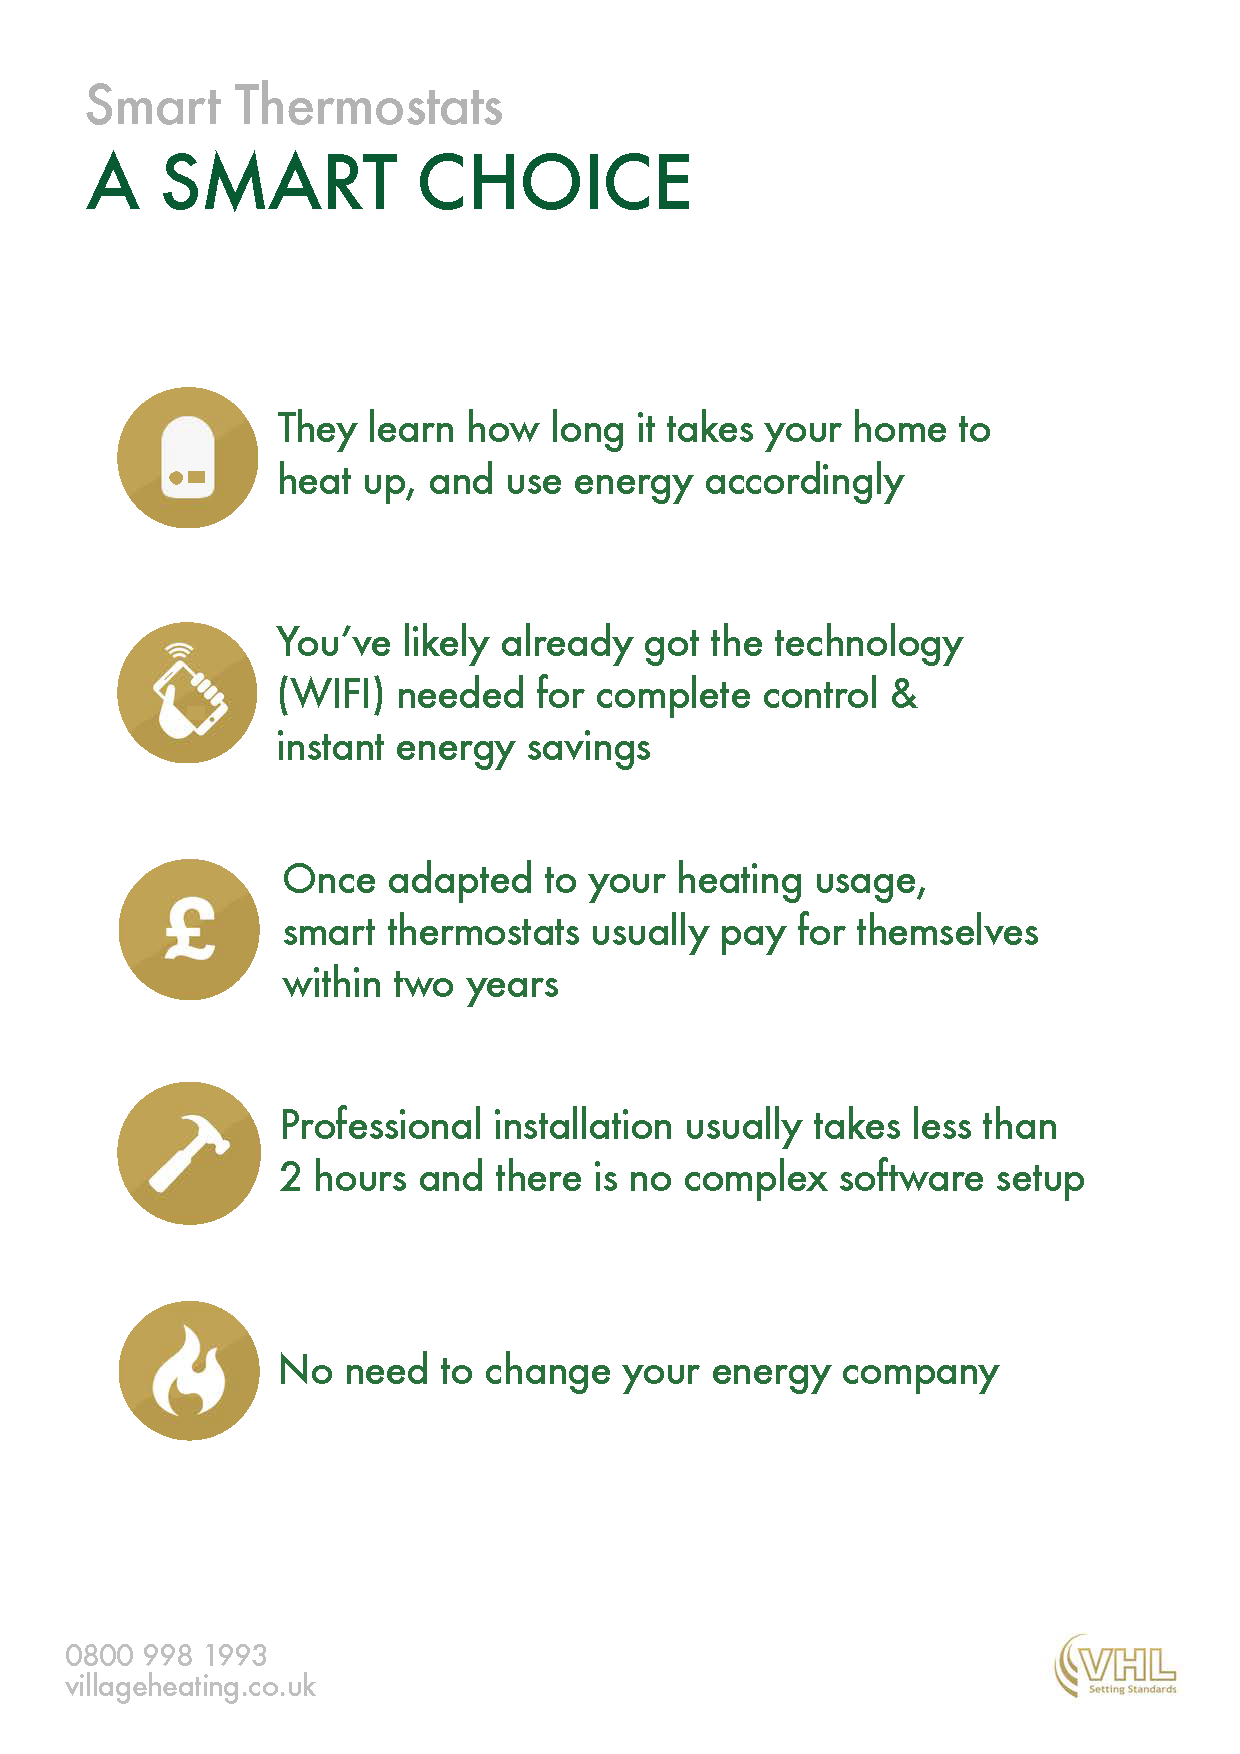 Smart thermostat benefits list